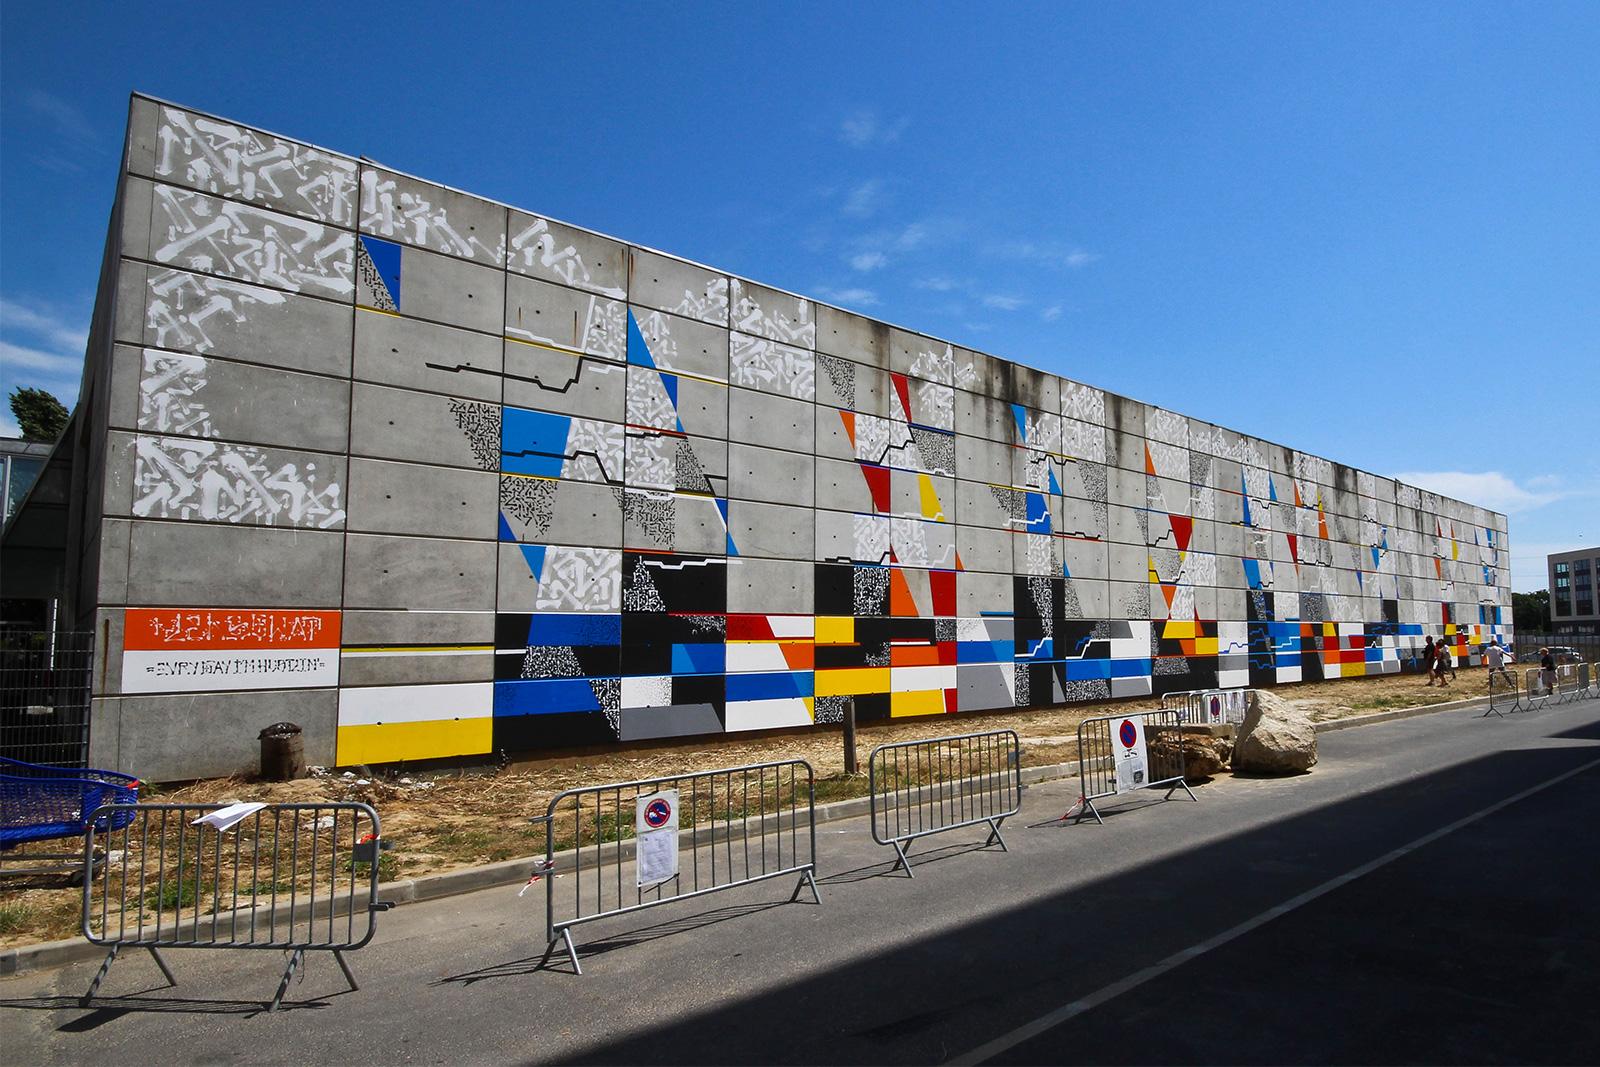 Lek-Sowat-DMV-da-mental-vaporz-graffiti-soldart-montana-bombe-spray-evry-paris-mur-peinture-nicolas-gzeley